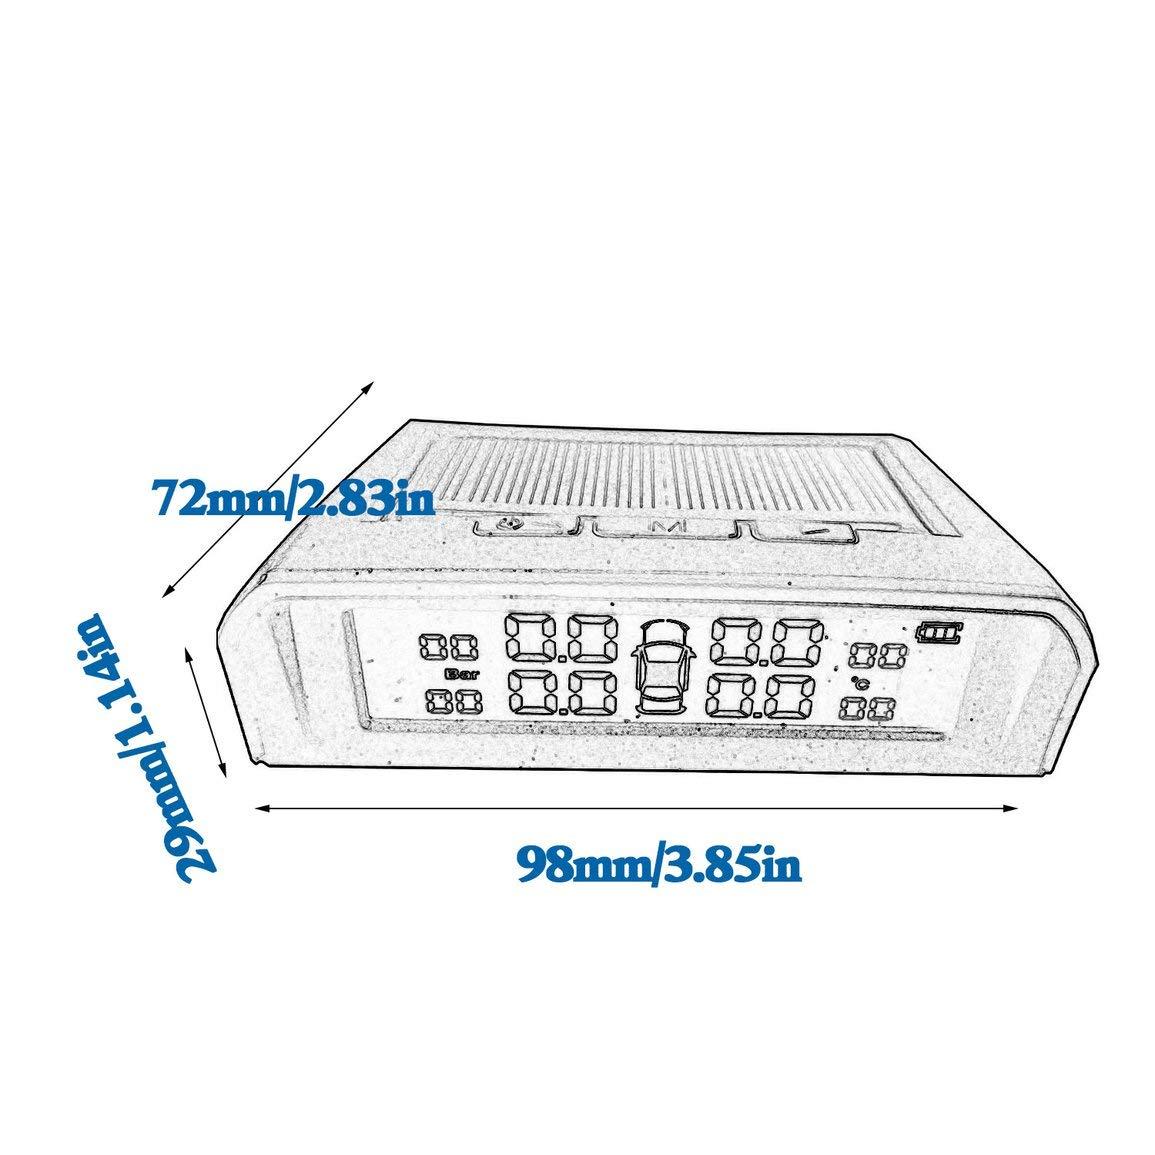 para Steelmate Tp-s1i Tpms presi/ón de los neum/áticos Monitor de Pantalla de 4 sensores internos Que Funcionan con Solar Sistema Inal/ámbrico